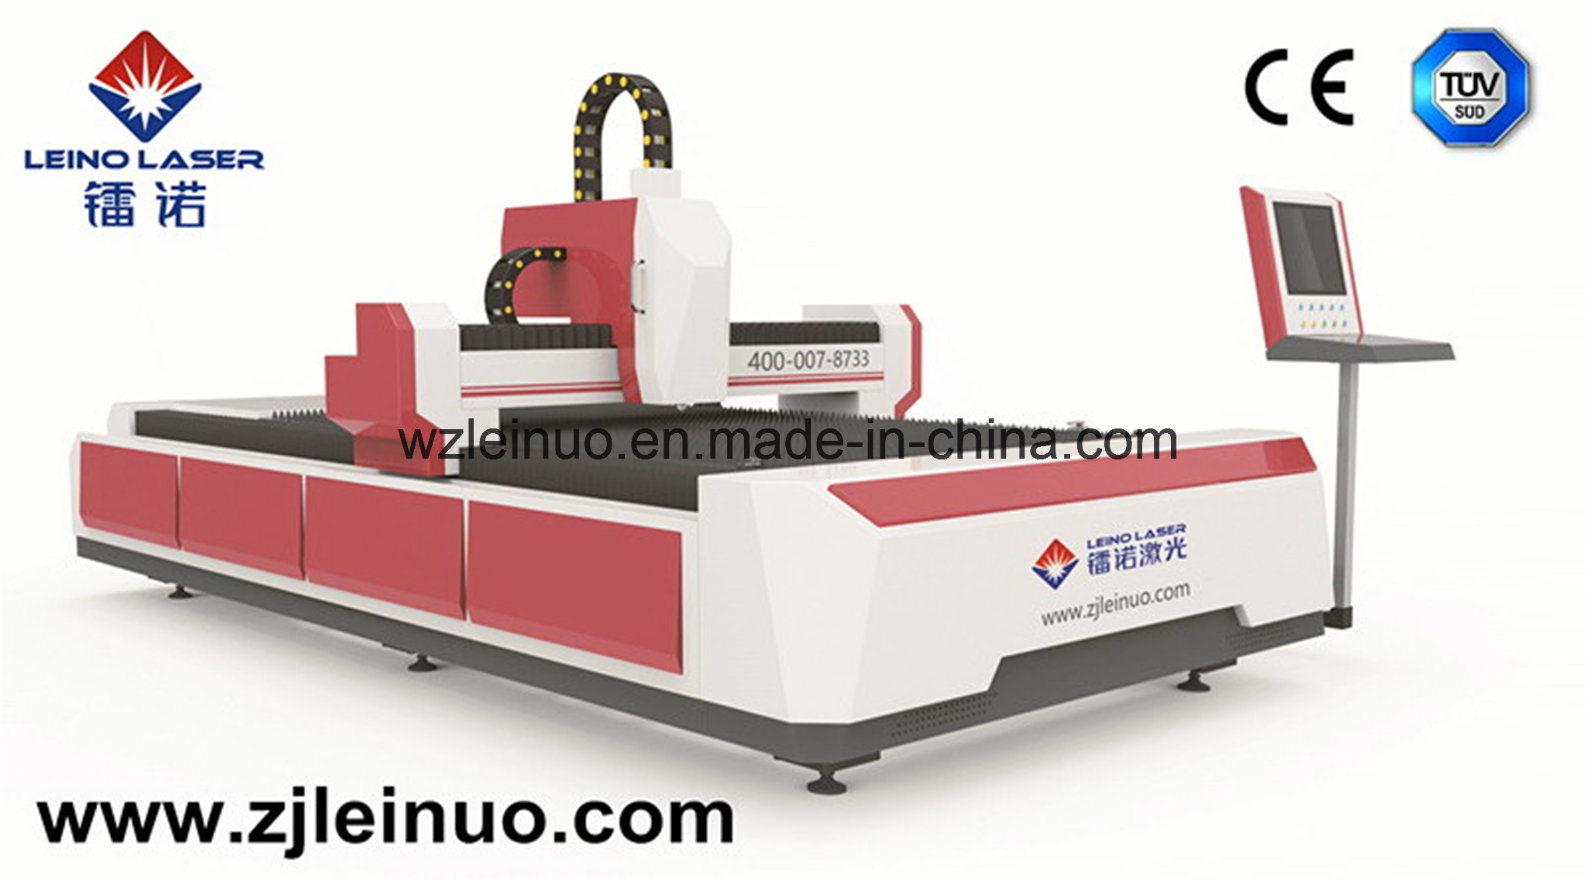 500W CNC Open-Type Fiber Laser Cutting Machine for Metal